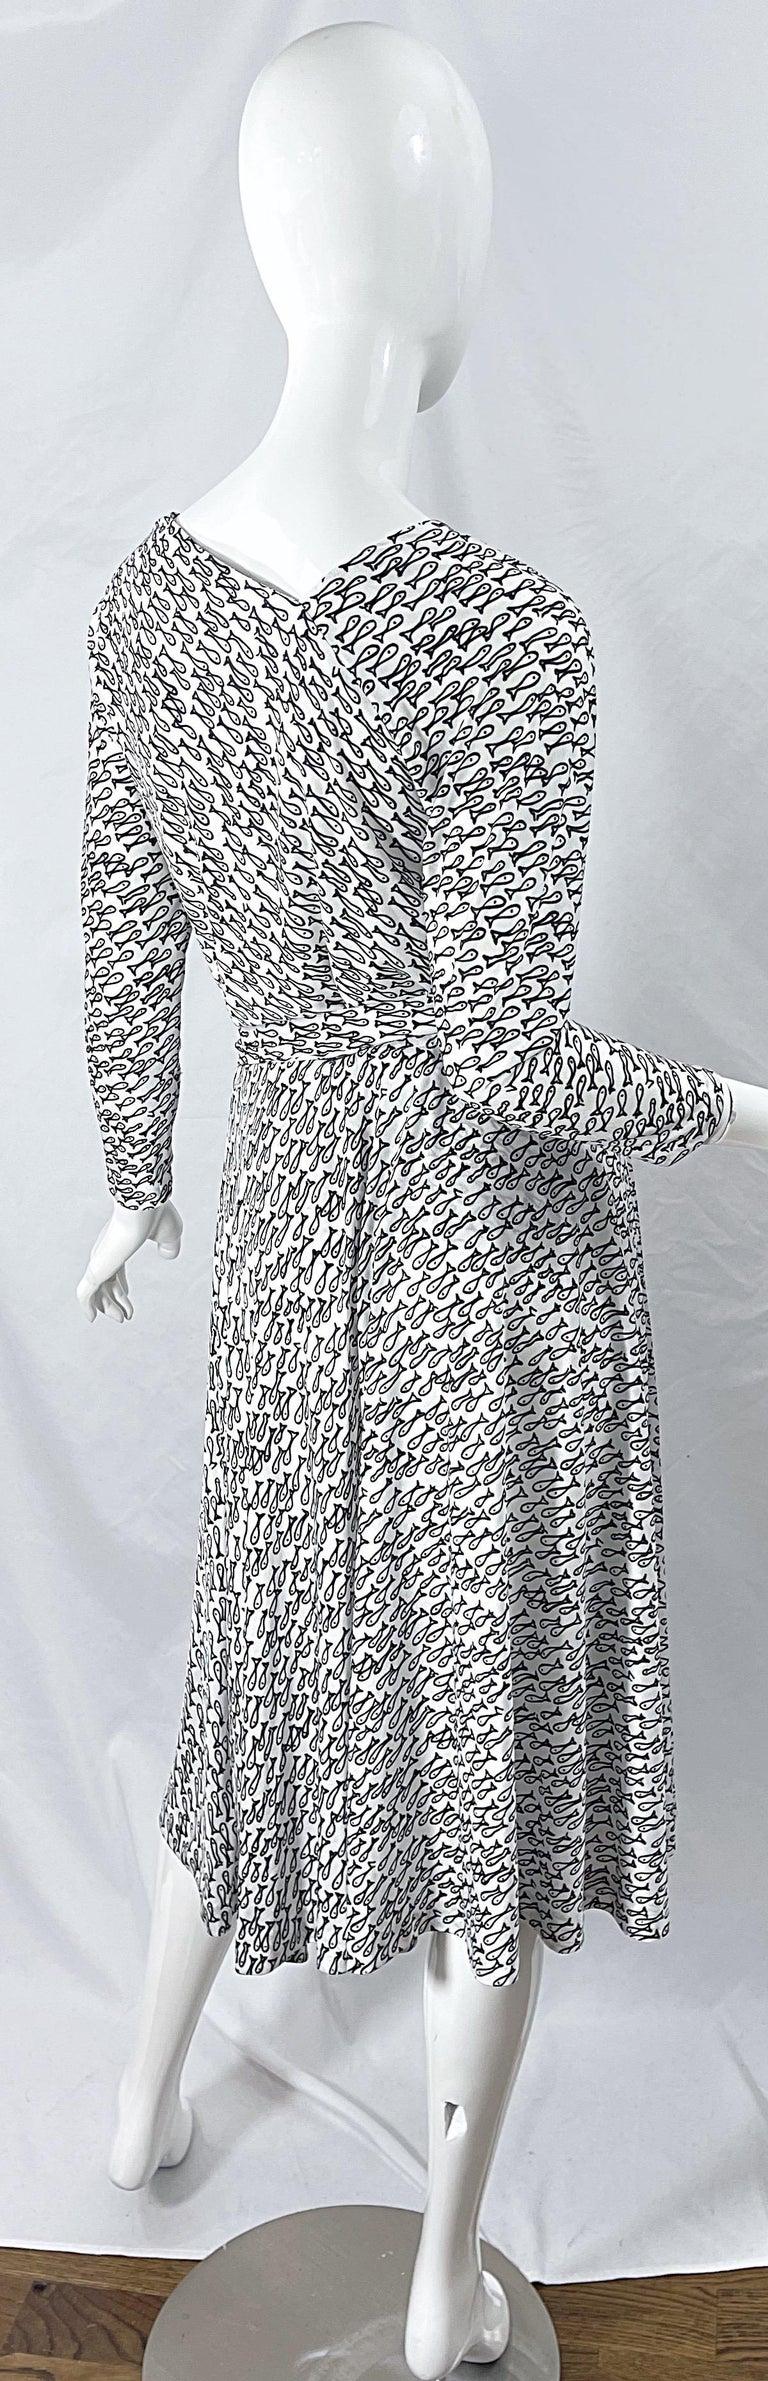 Women's Halston IV 1970s Rare Novelty Fish Print Black and White Vintage 70s Ensemble For Sale